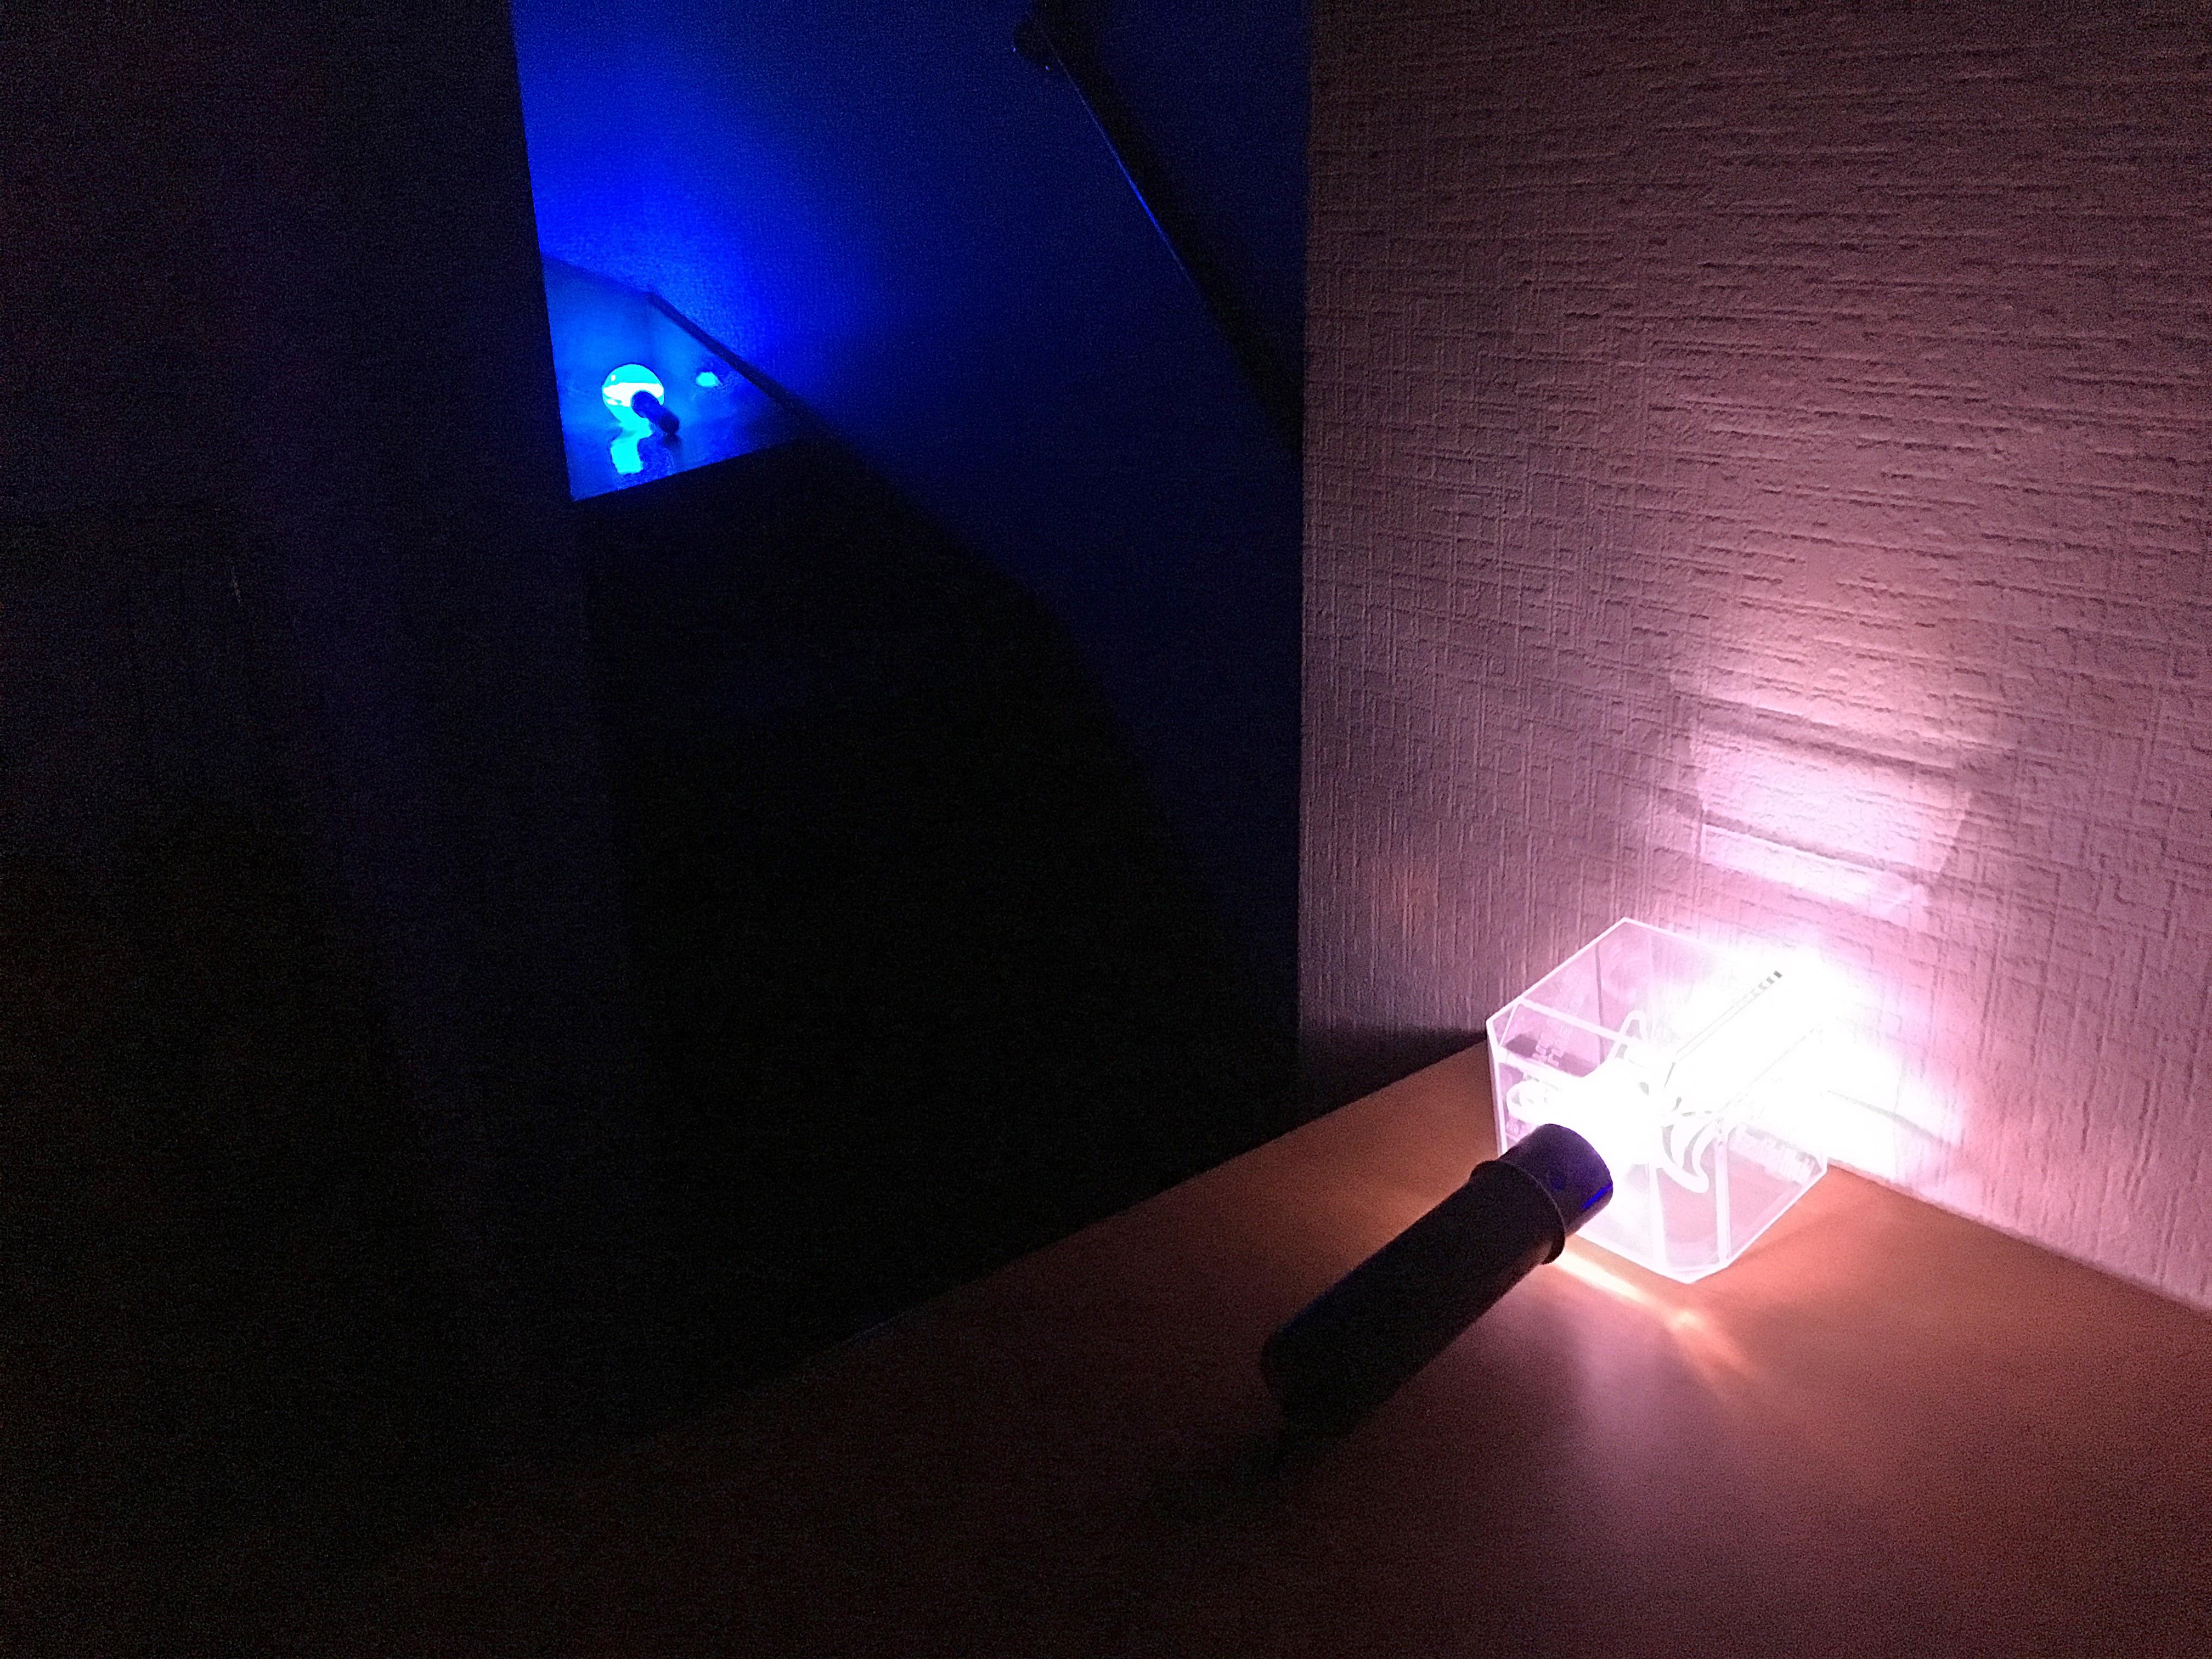 北海道胆振東部地震 停電時照明 嵐ペンライト 180906 (3).JPG